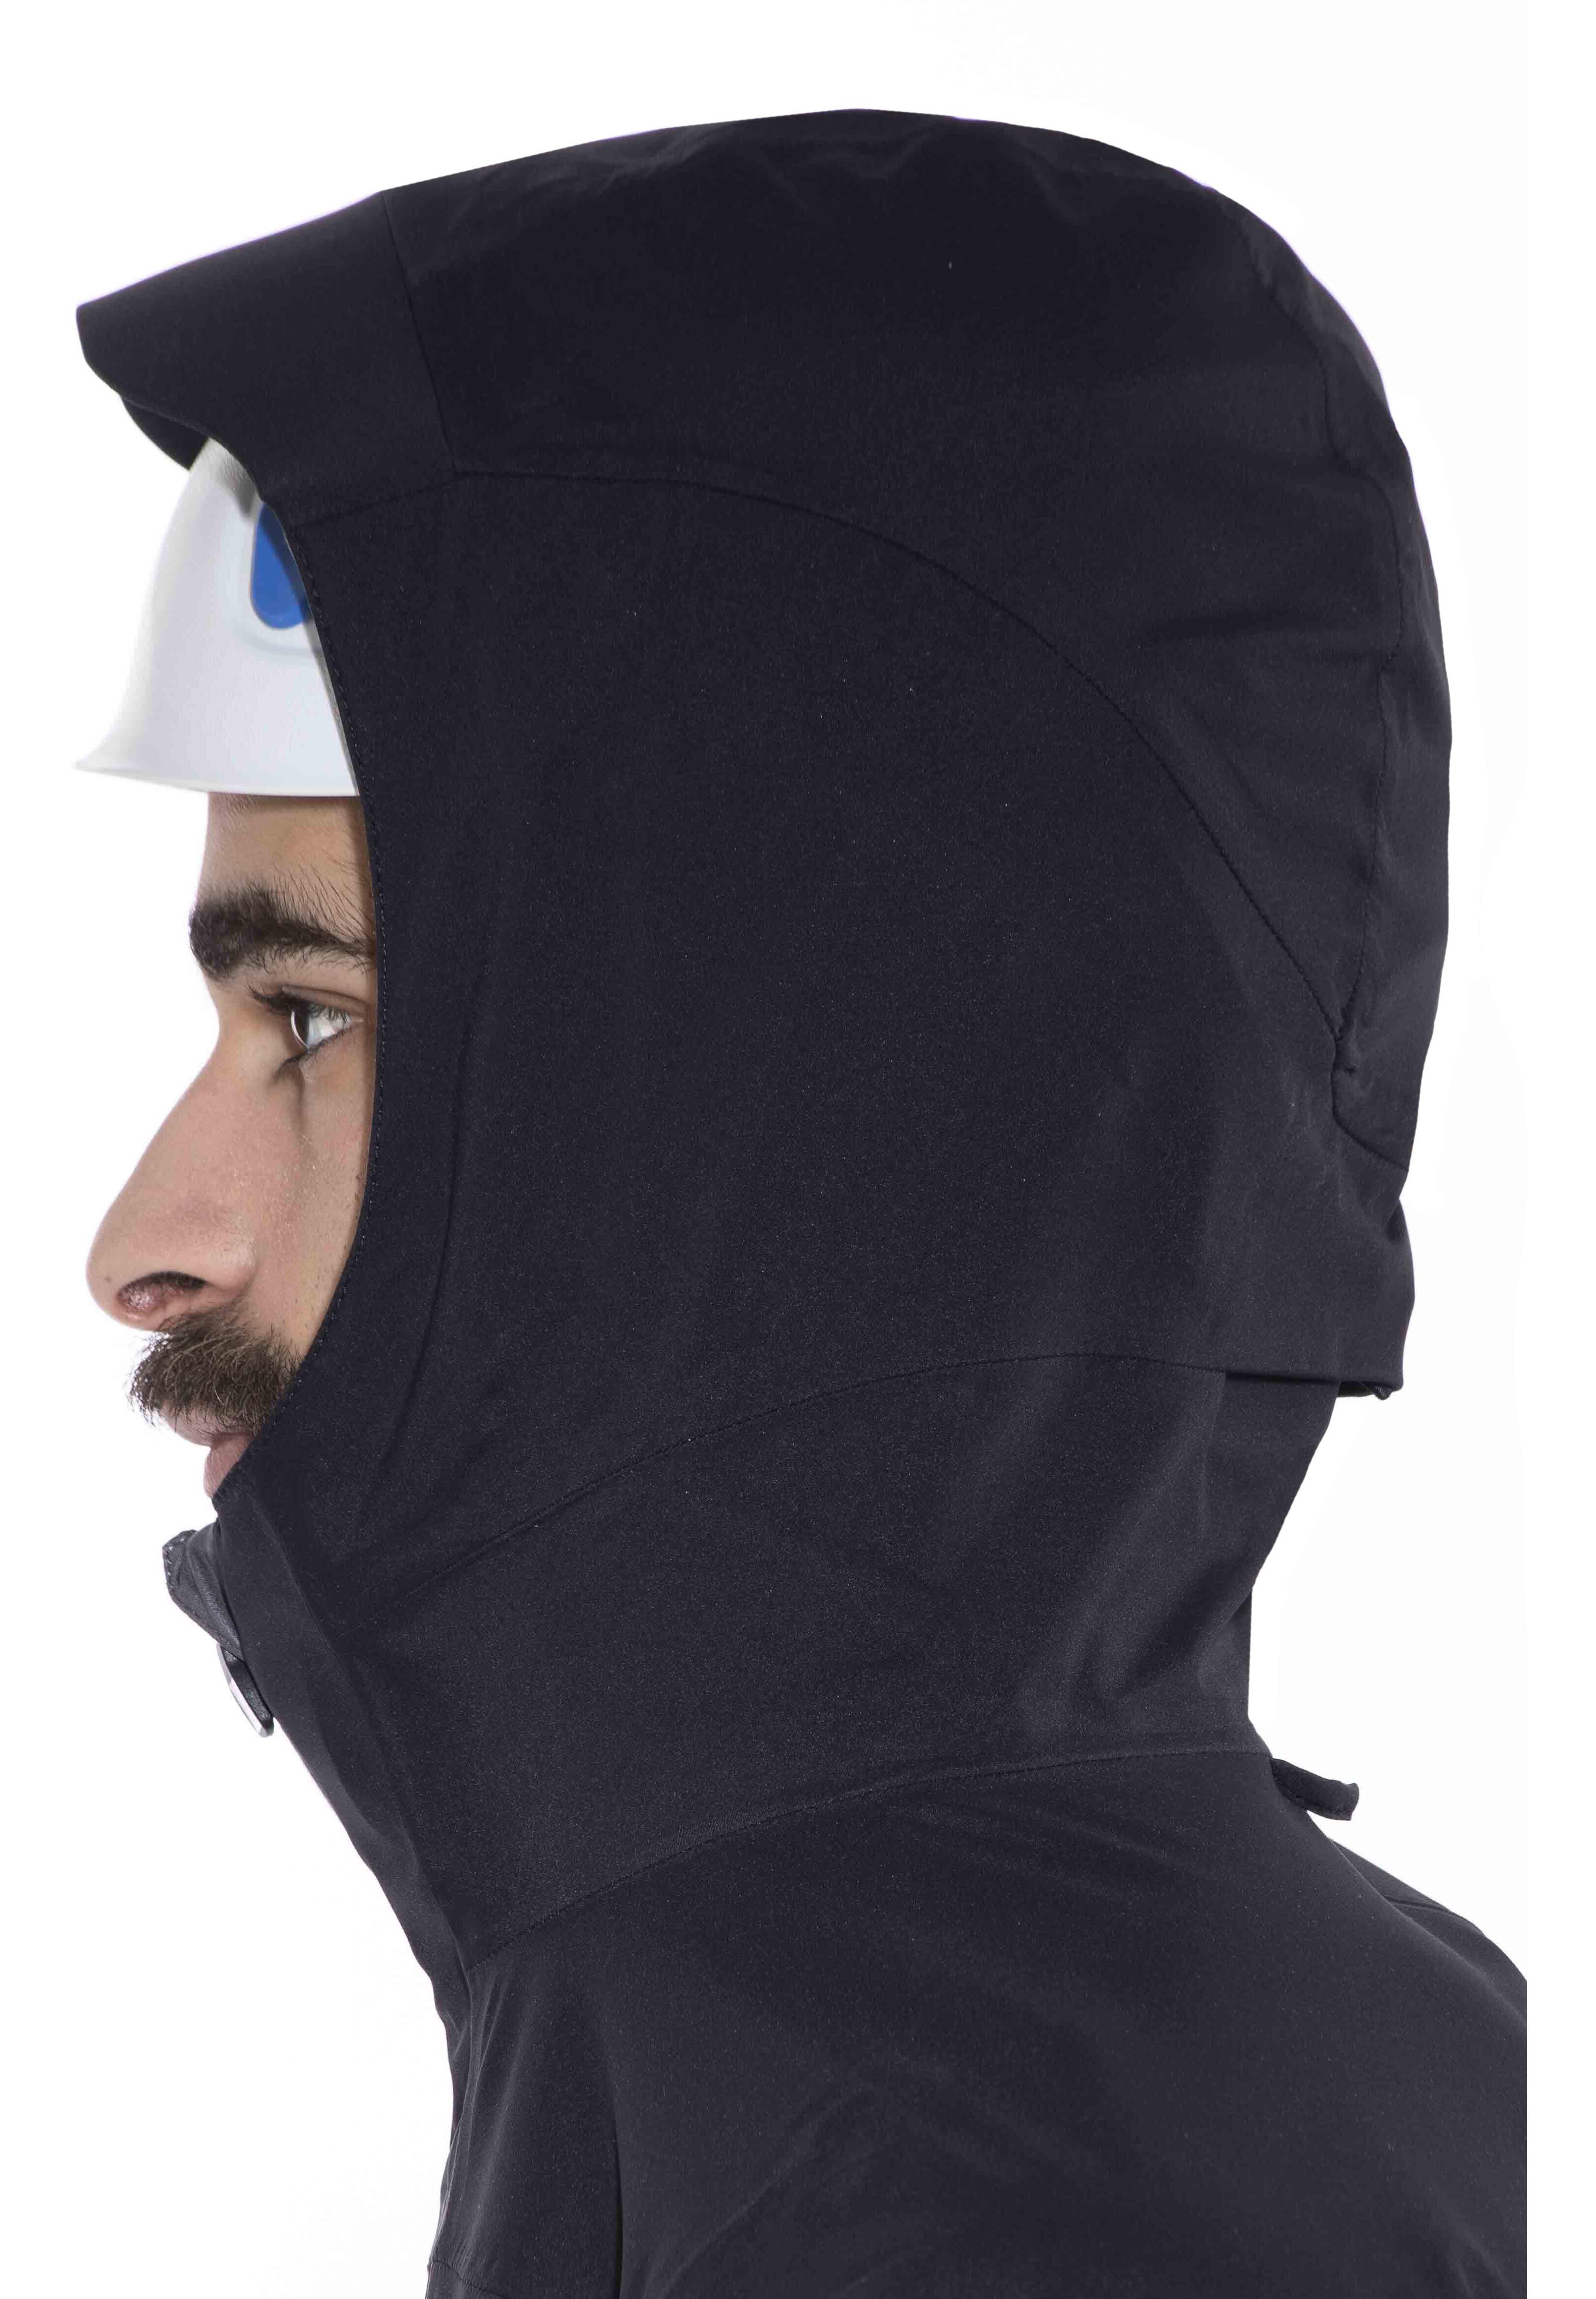 d6f94a7b 66° North Snaefell Neoshell Jacket Herrer, black | Find outdoortøj ...